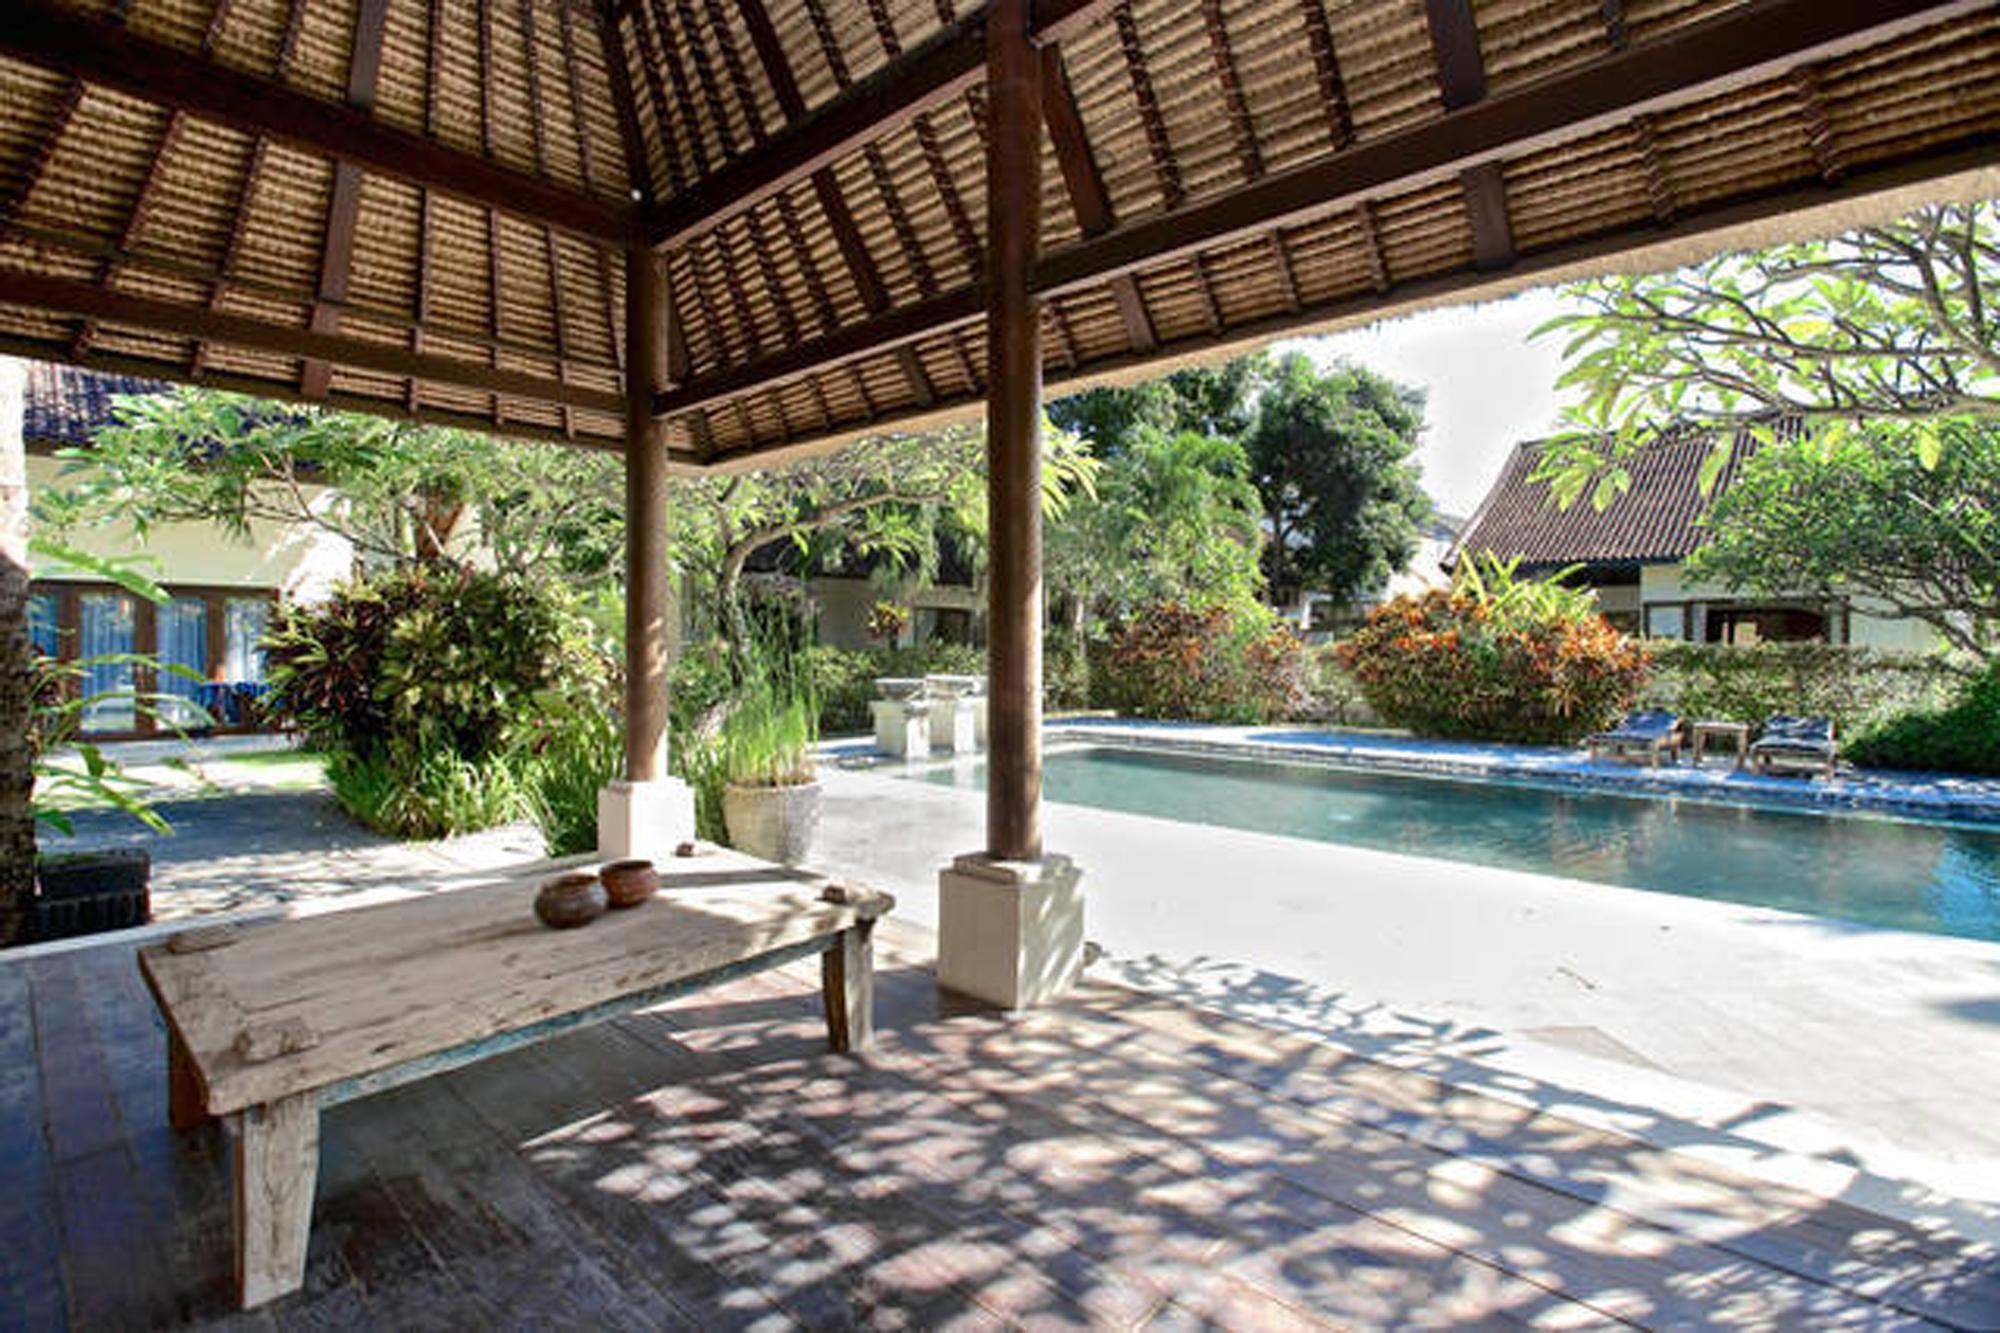 Sayang Taman 1 Villa 5 mnts walk to Sanur beach